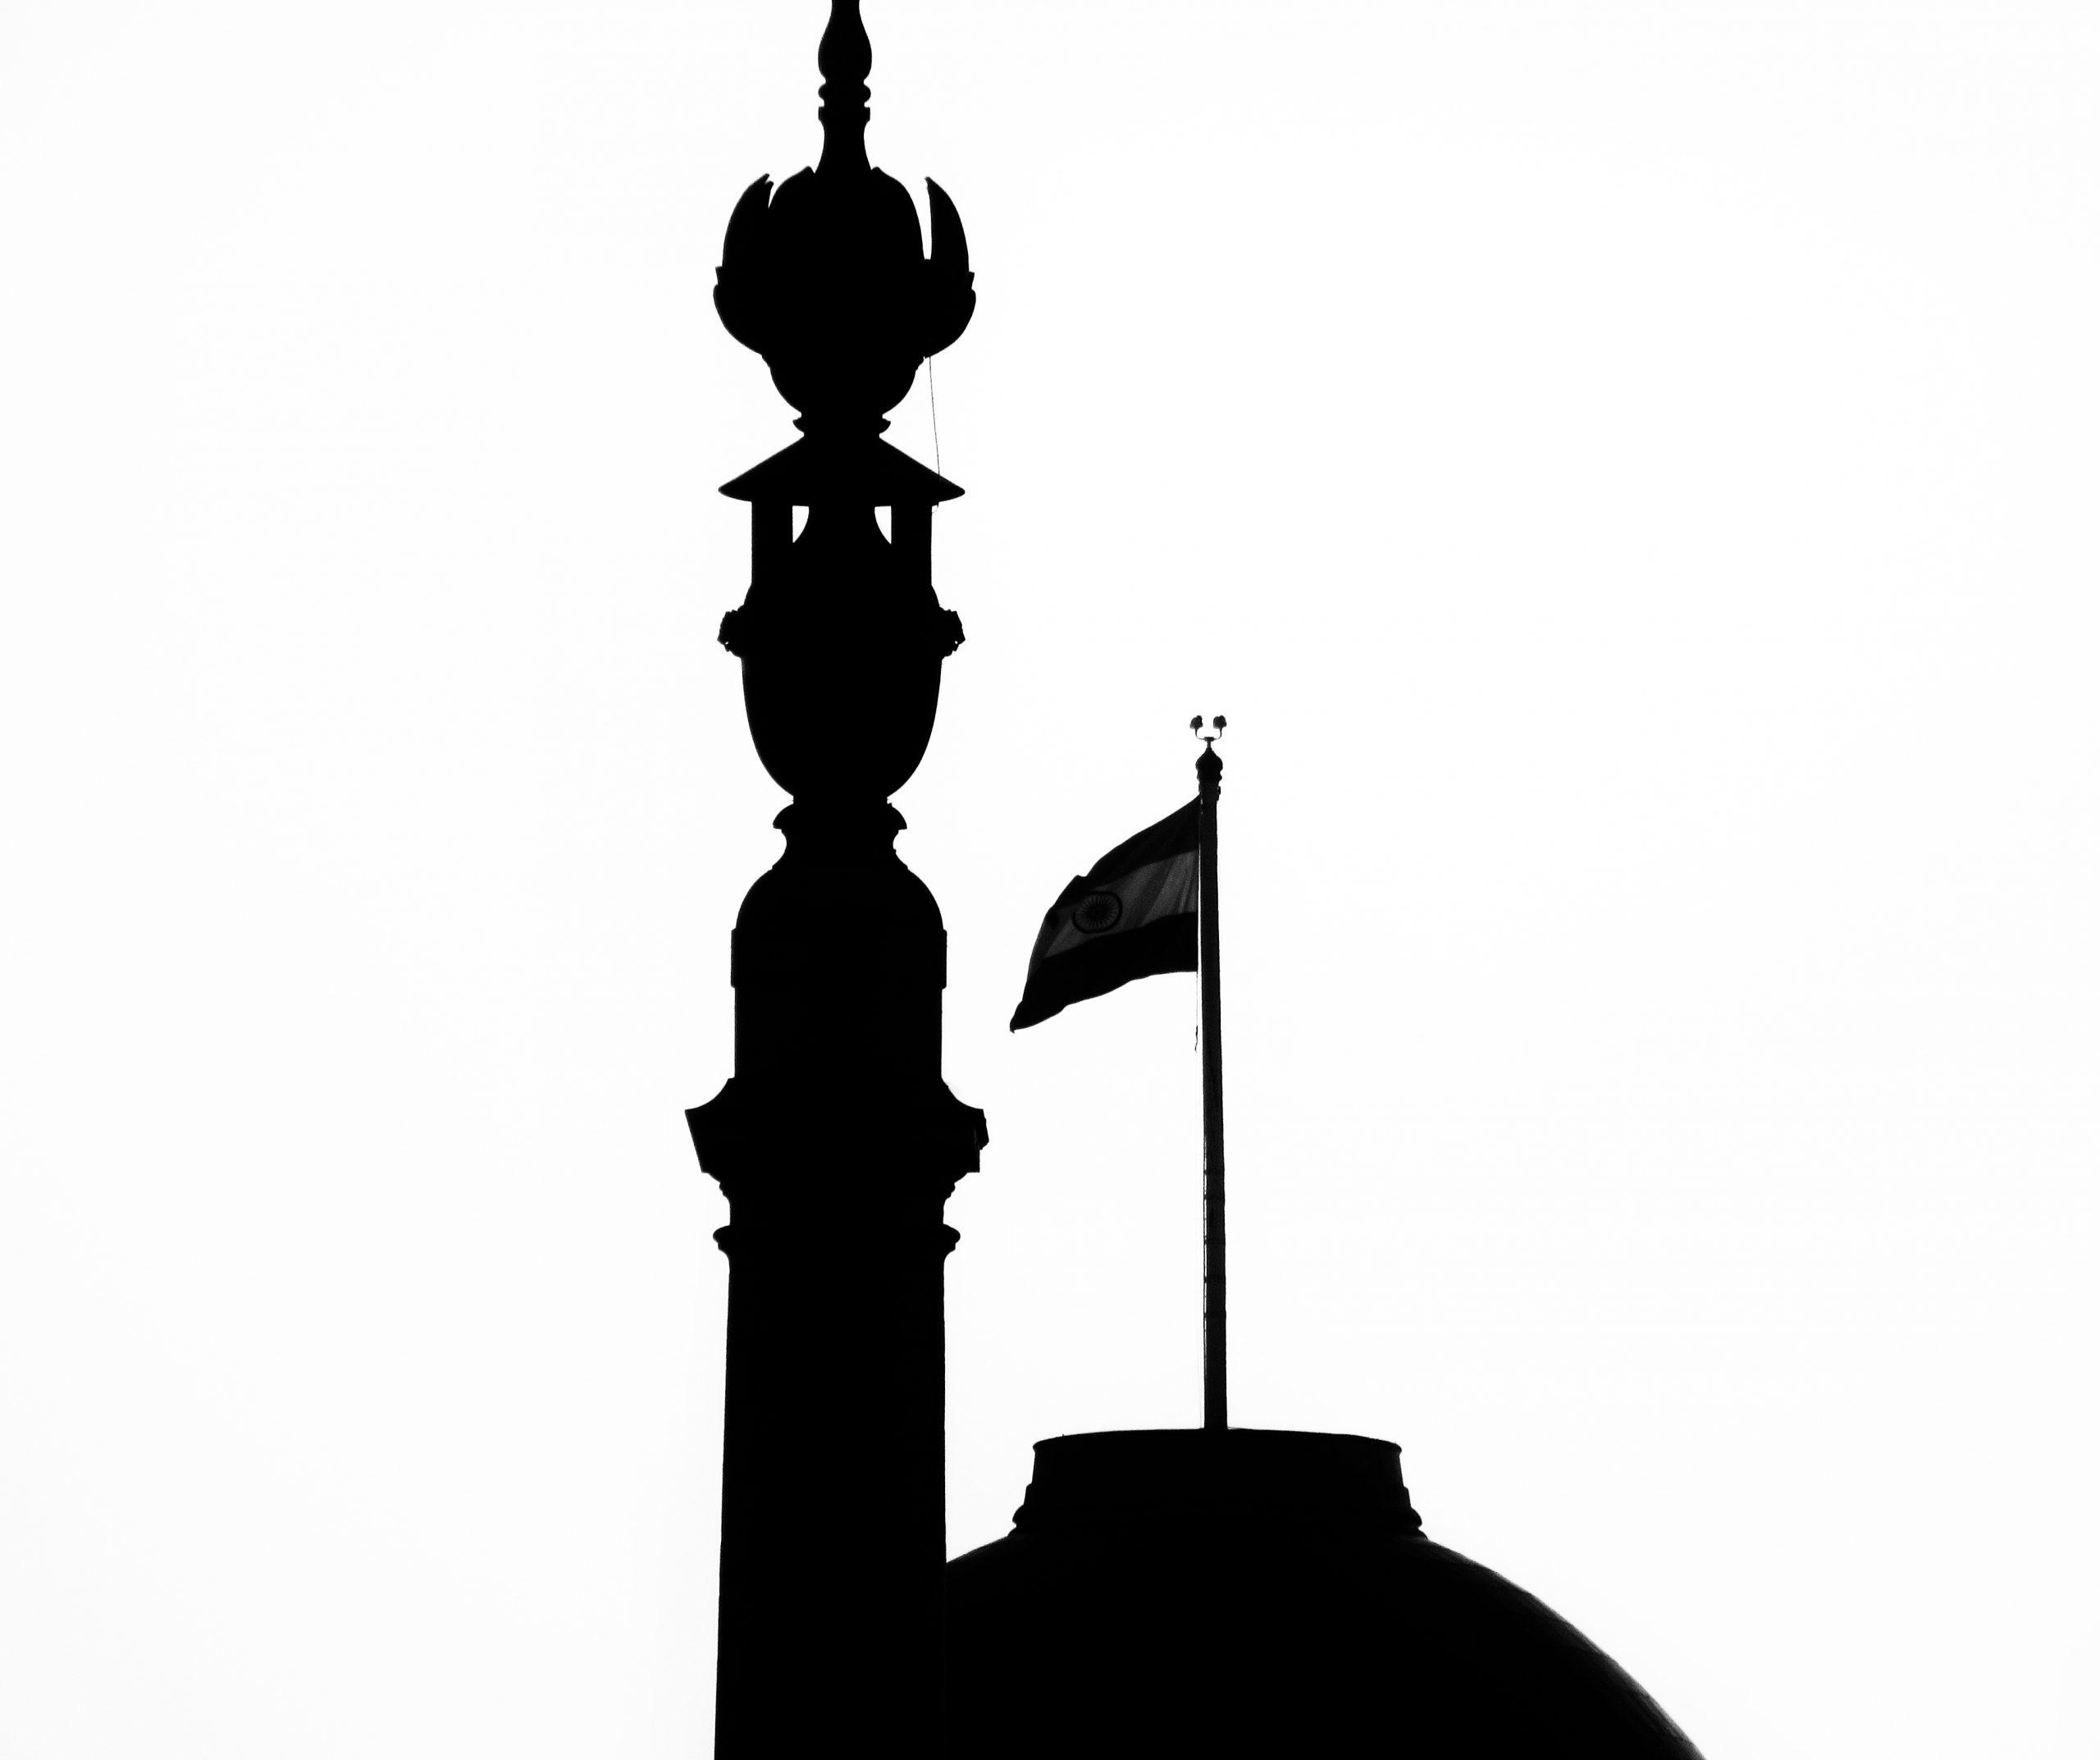 Indian flag on a landmark